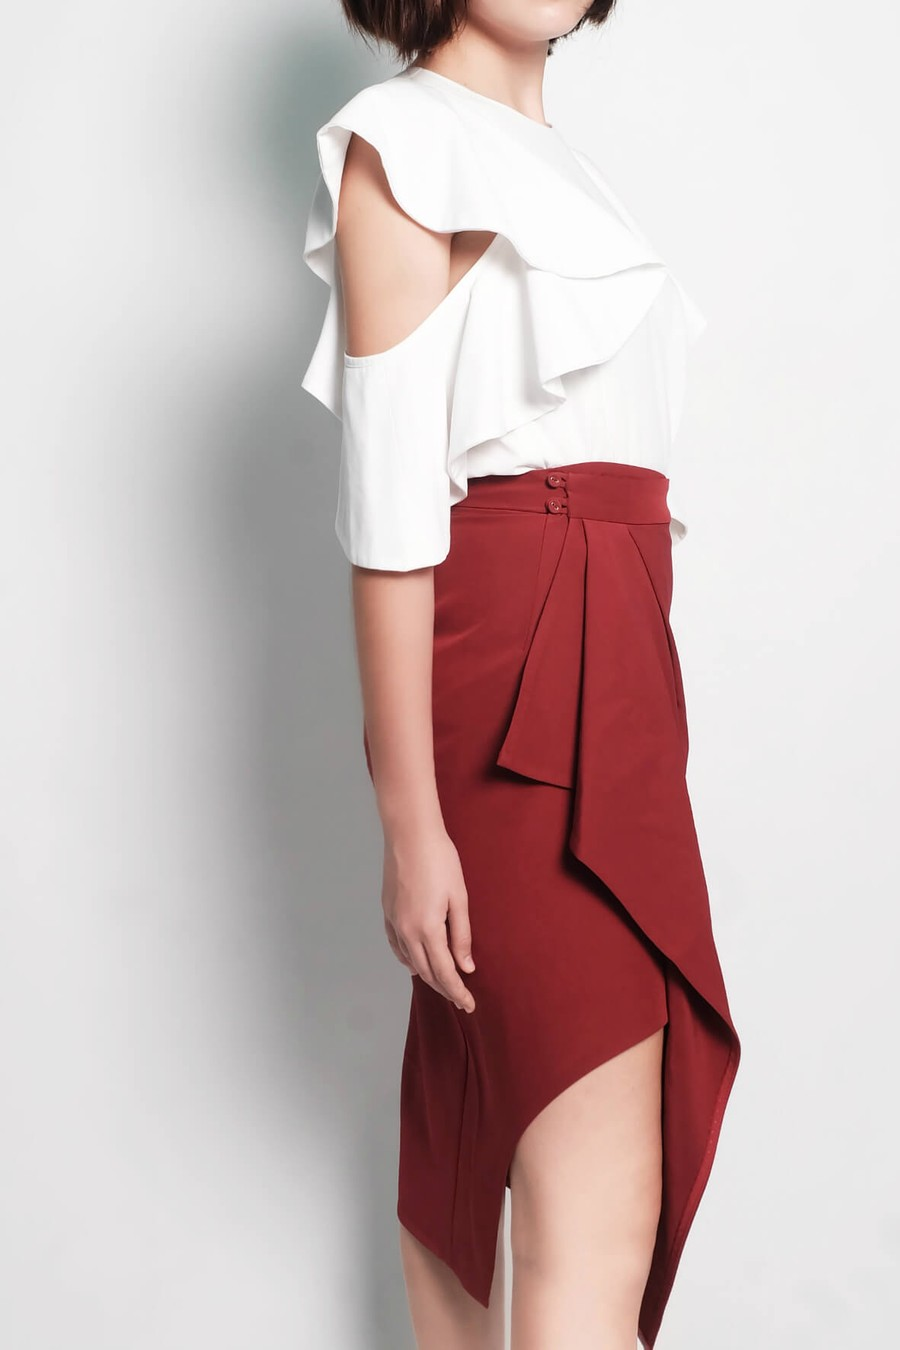 Style Theory_aijek-coretta-ruffled-skirt-4